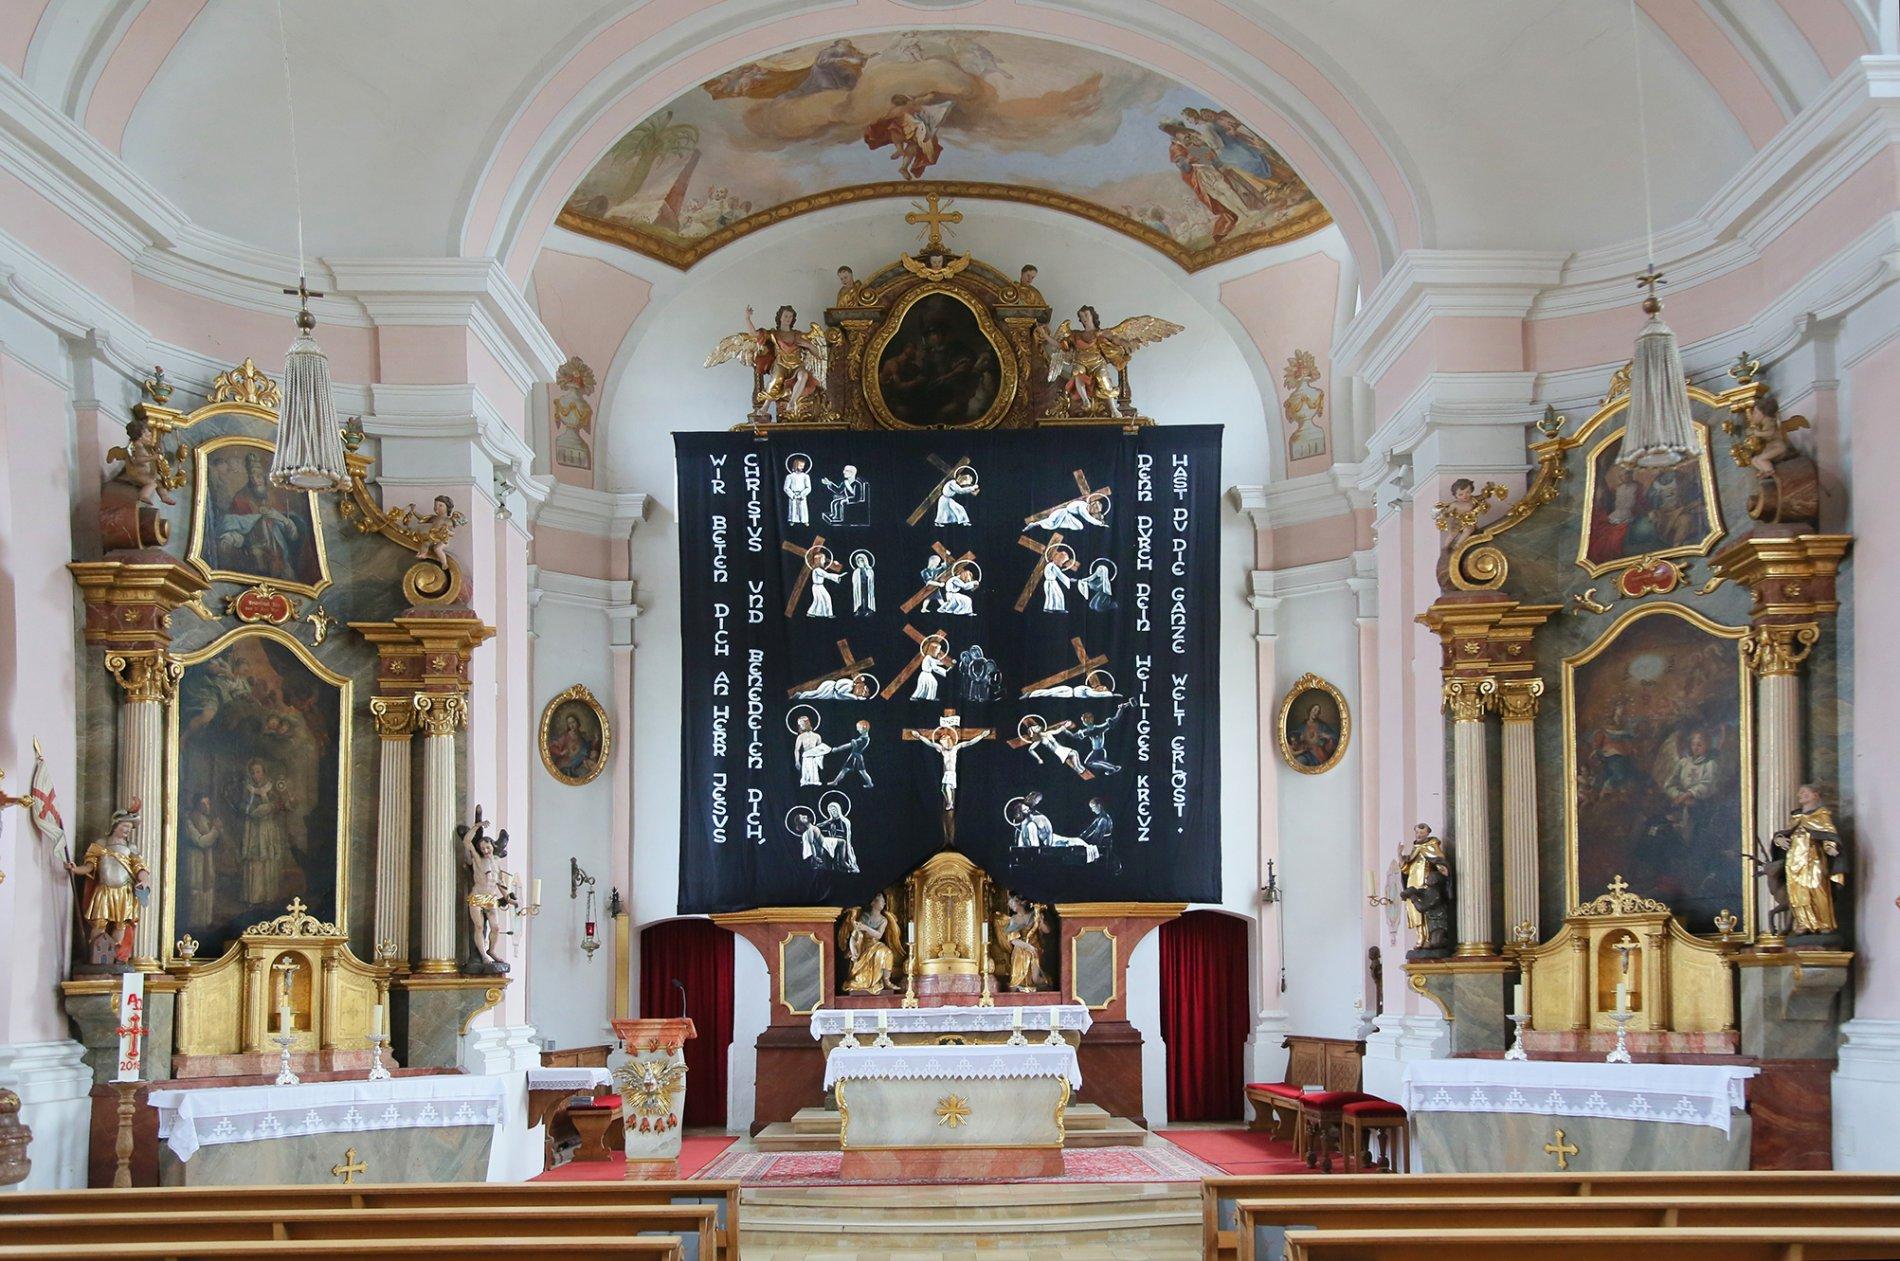 Blick auf den Altar im Inneren der St. Joseph-Kirche in Allershausen